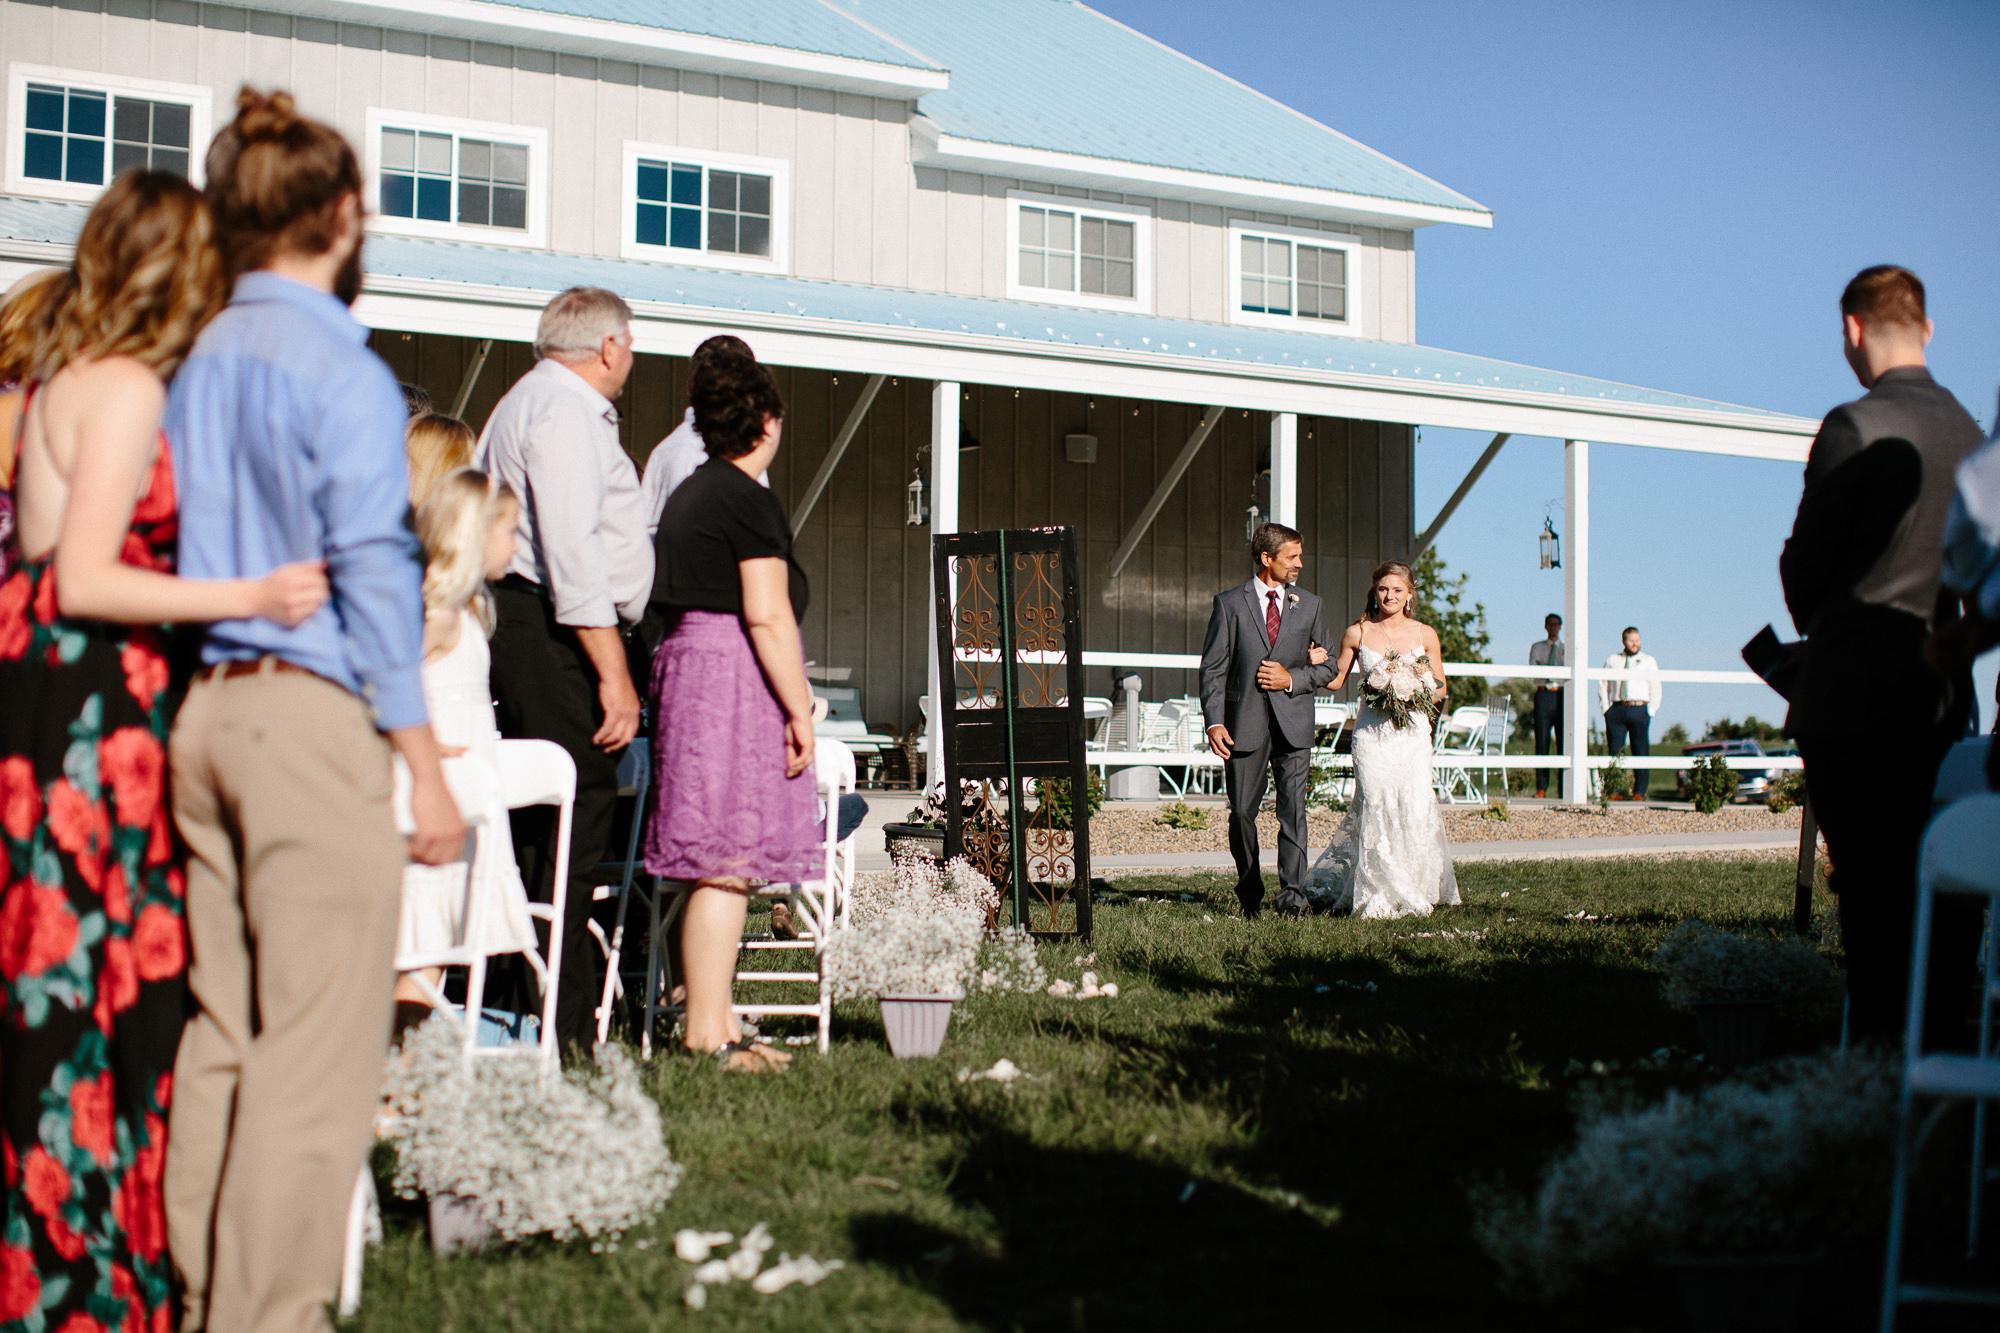 wedding-elopement-adventerous-romantic-timeless-south-dakota-blue-haven-barn-034.jpg